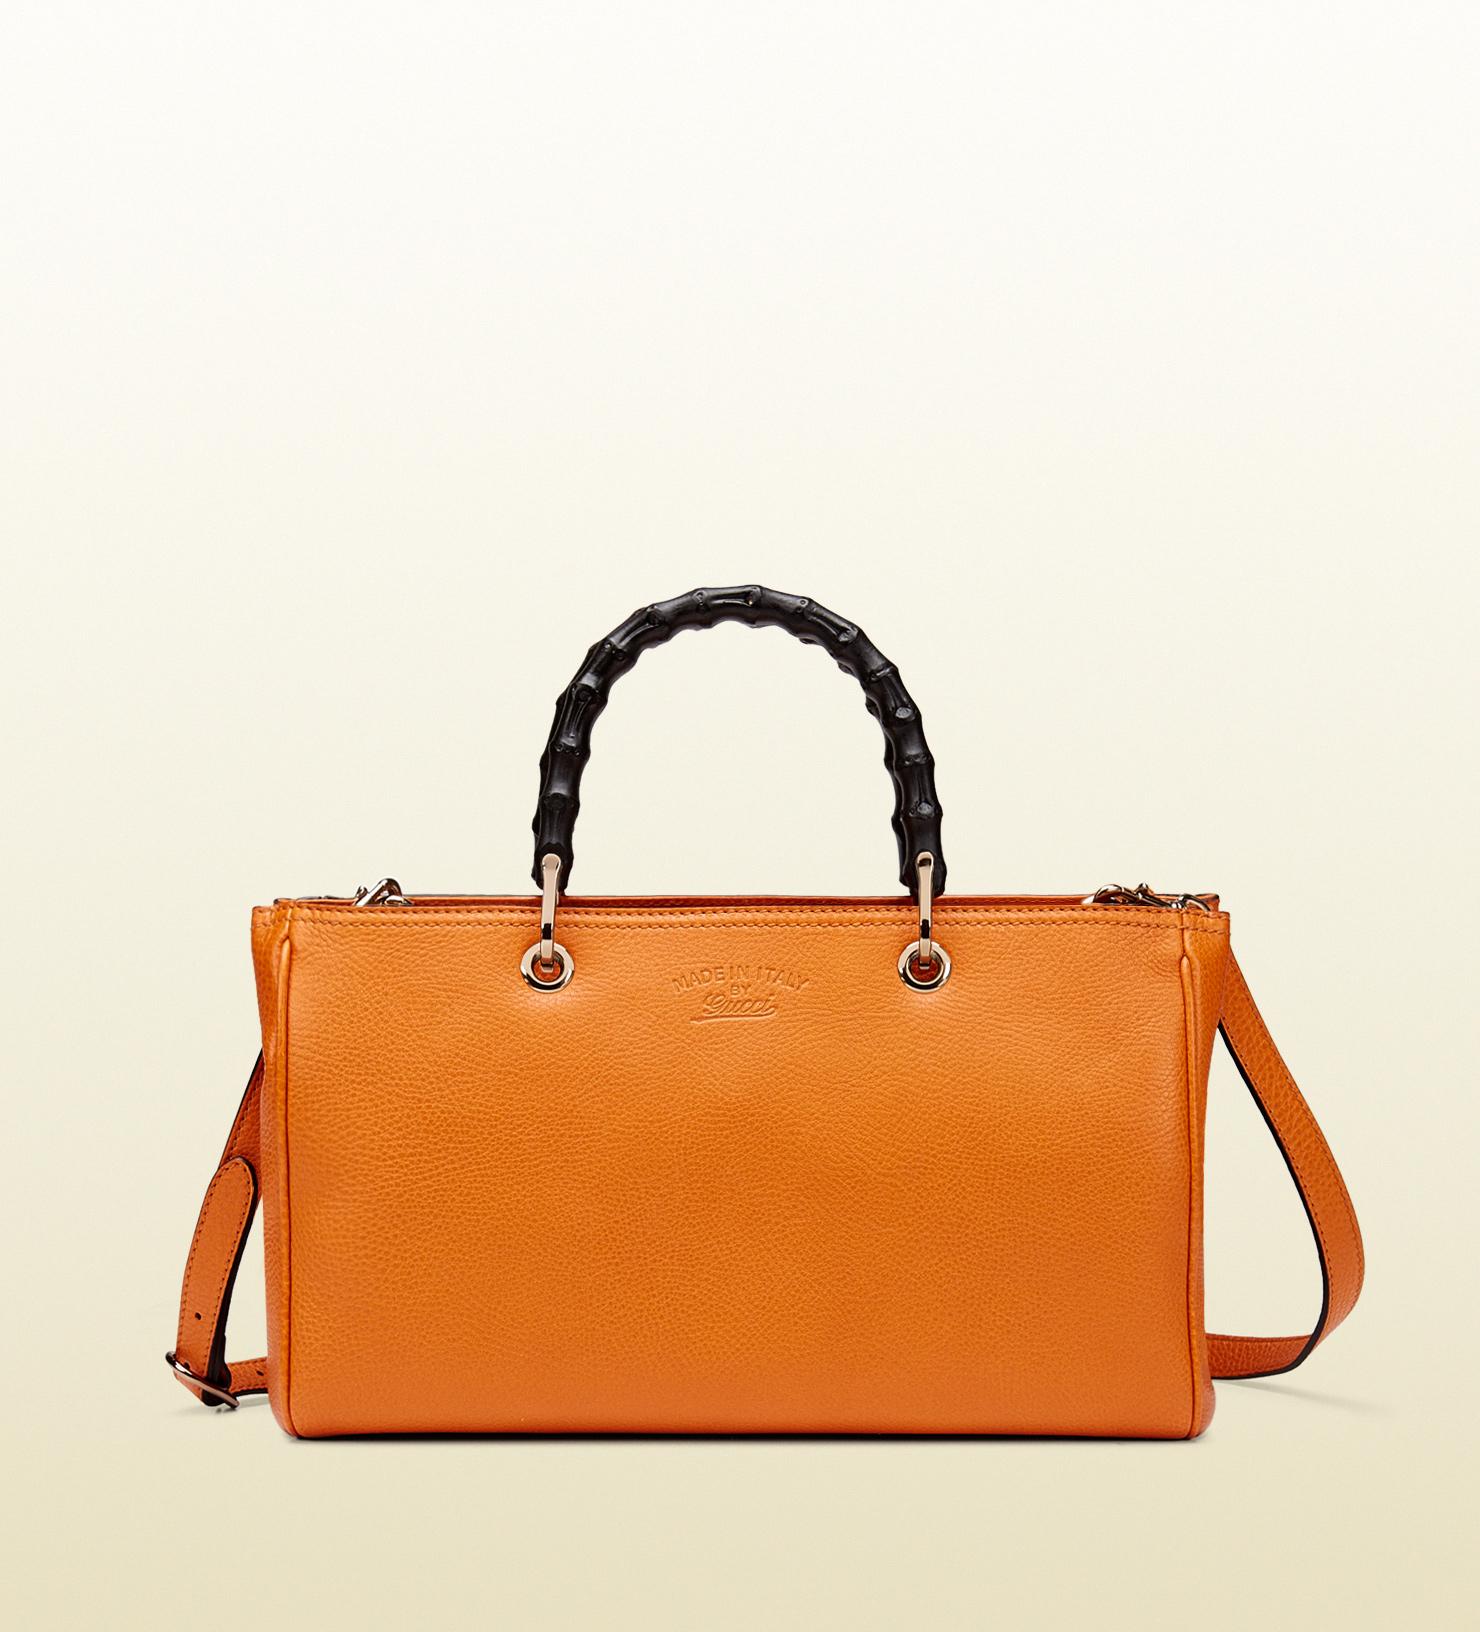 b4e548b69 Gucci Bamboo Shopper Leather Tote in Orange - Lyst